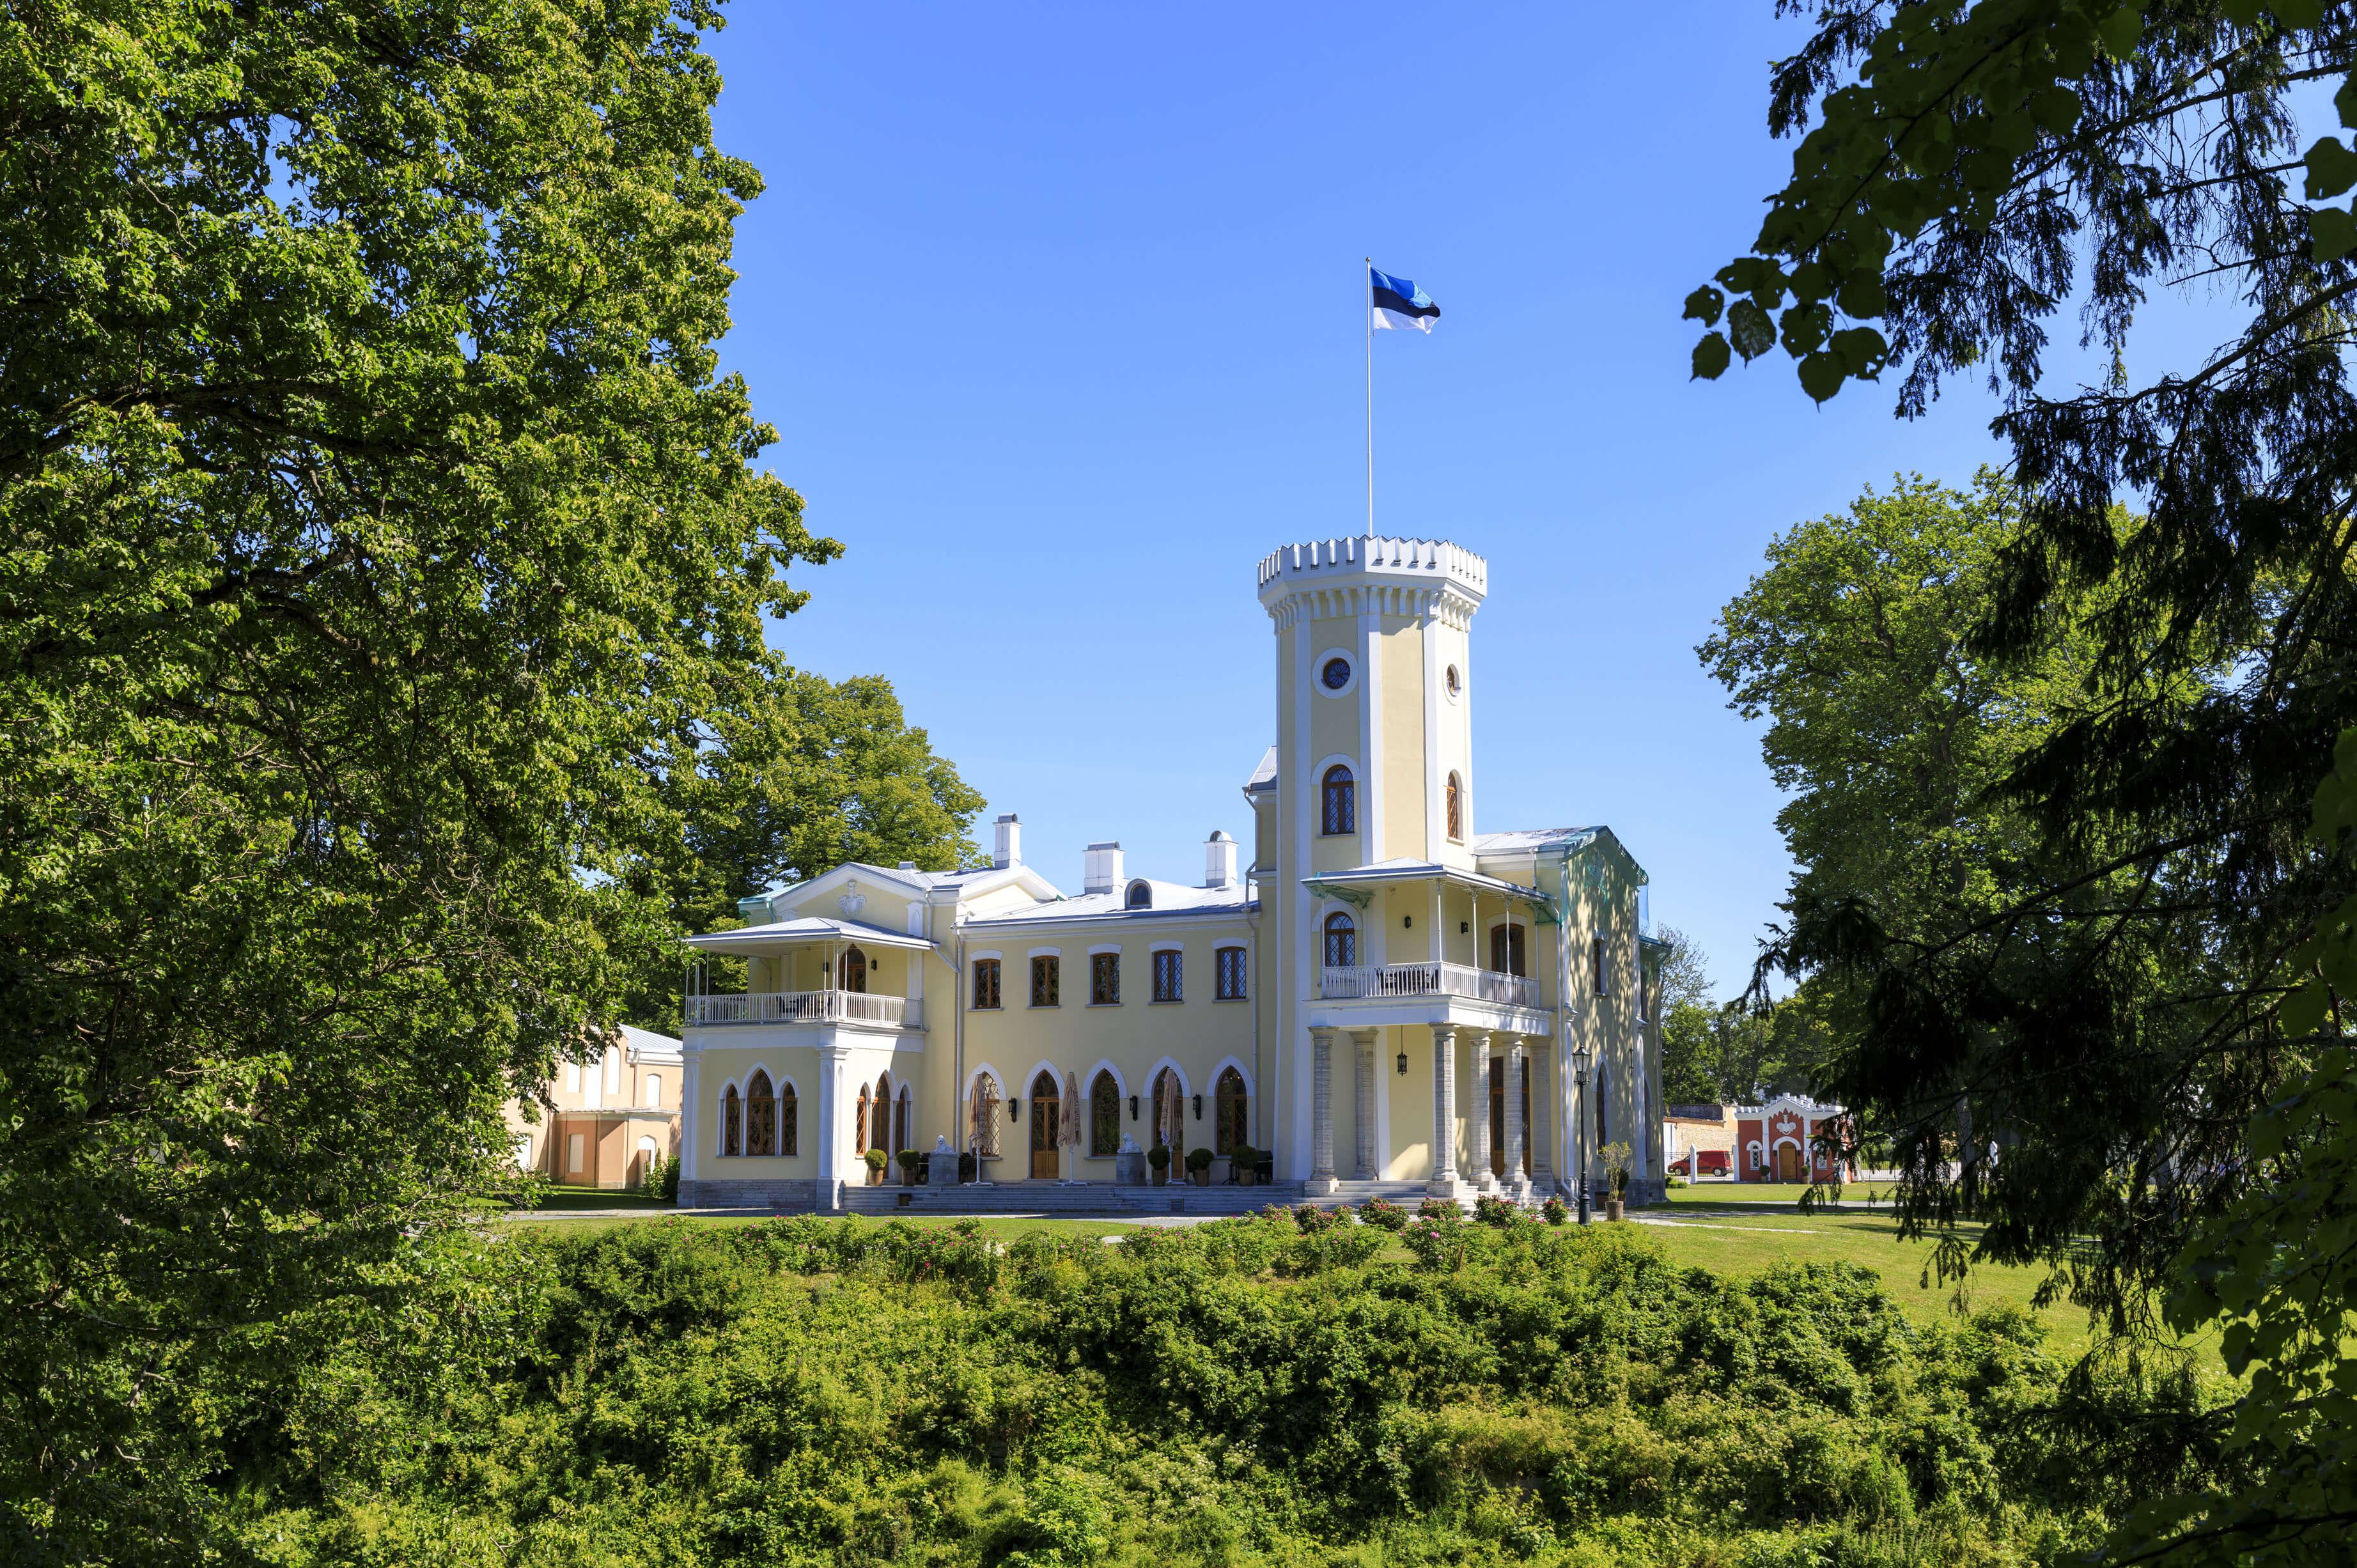 Castle or manor of Keila Joa in Estonia